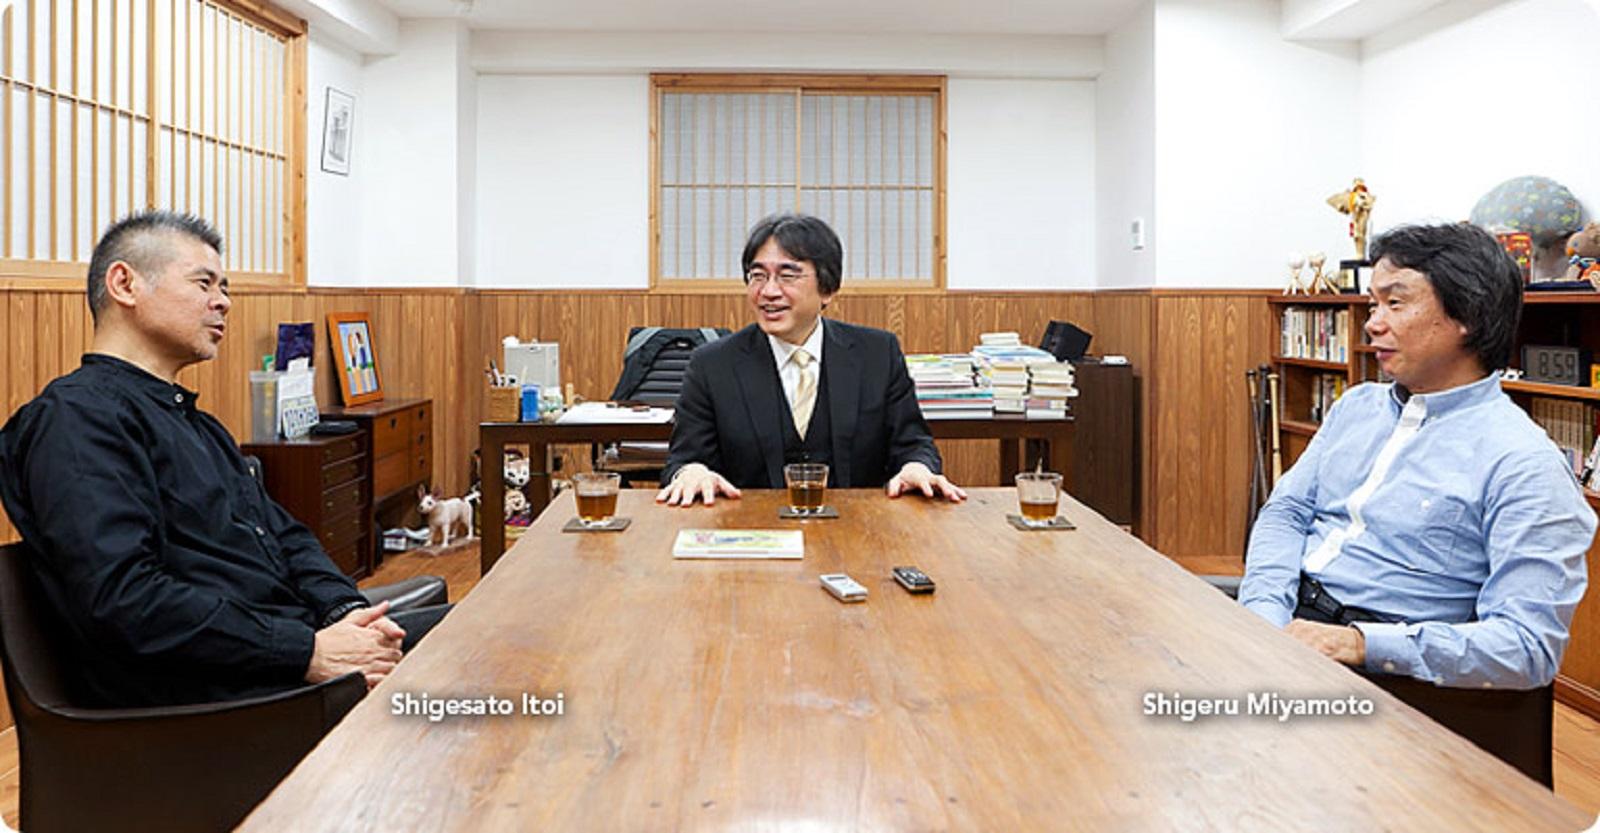 EarthBound Creator Shigesato Itoi with Satoru Iwata Shigeru Miyamoto RIP